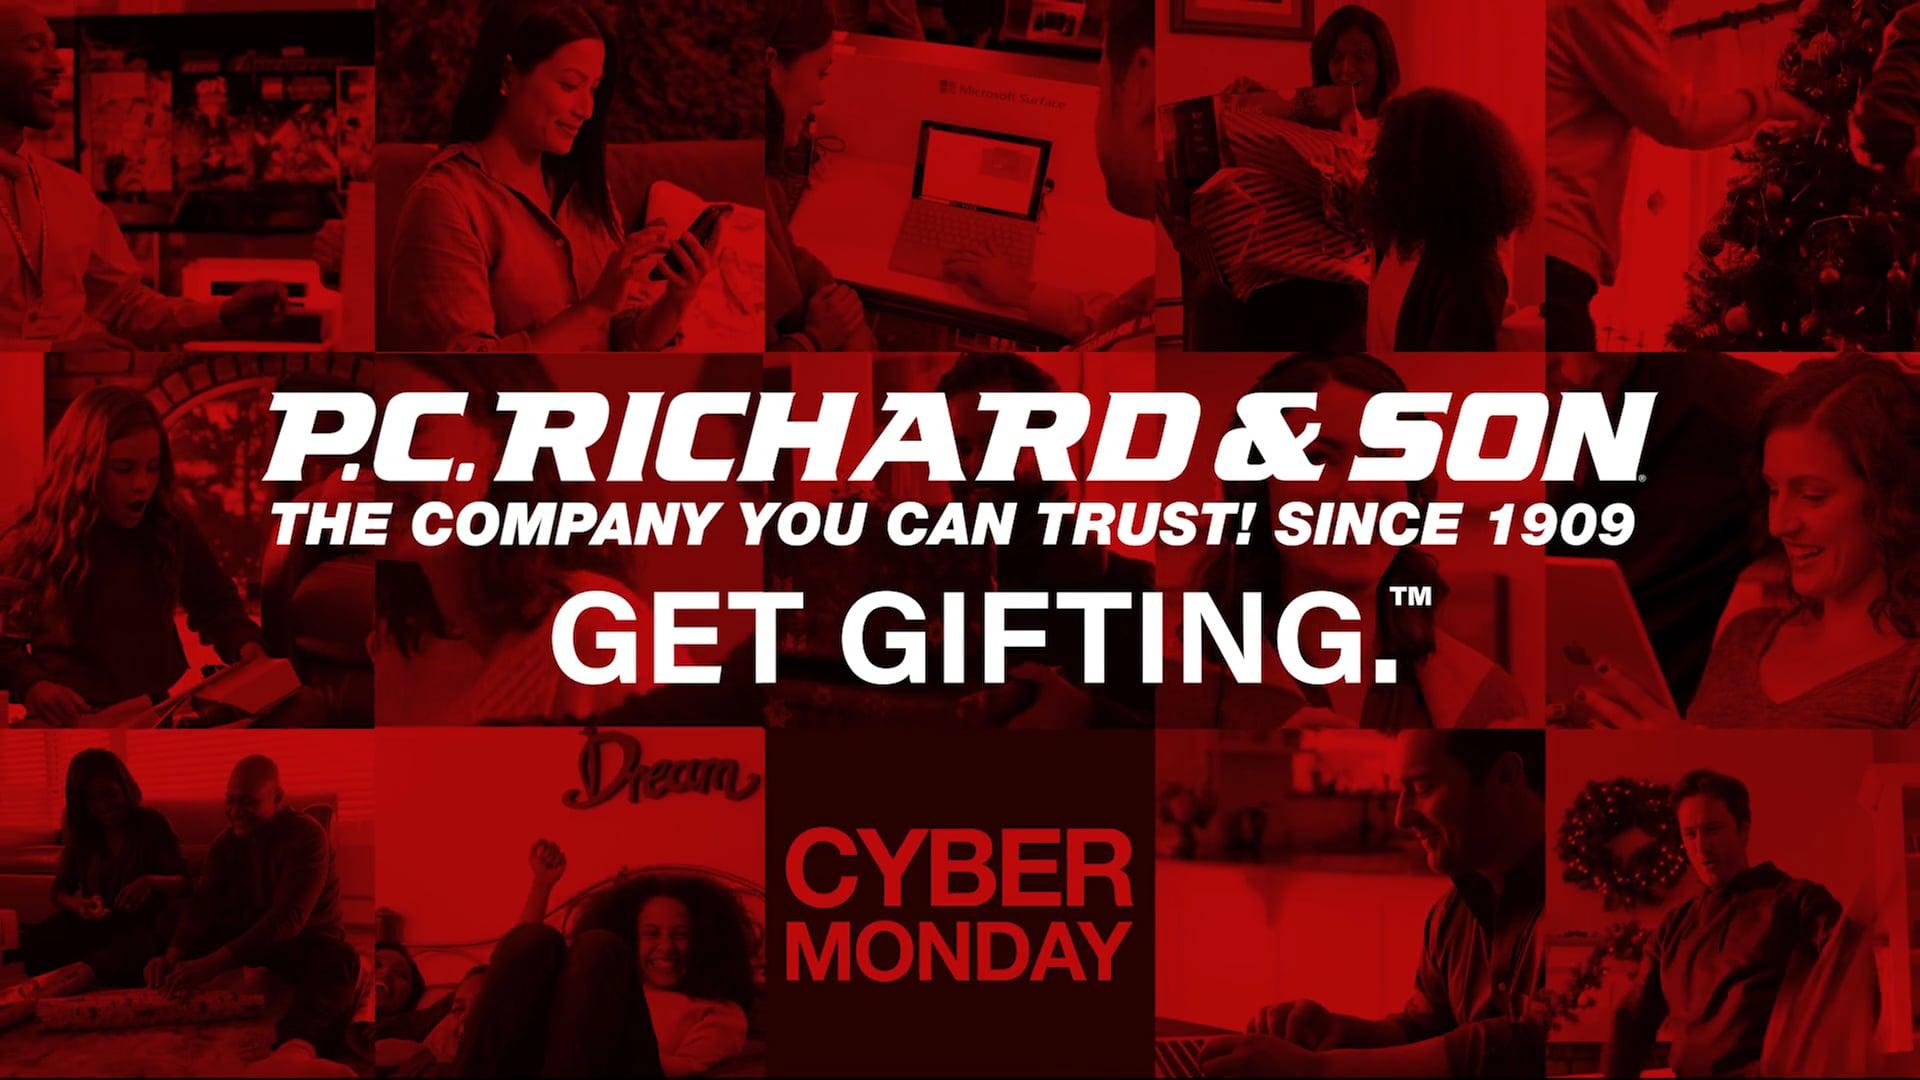 PC Richard & Sons - Cyber Monday :30